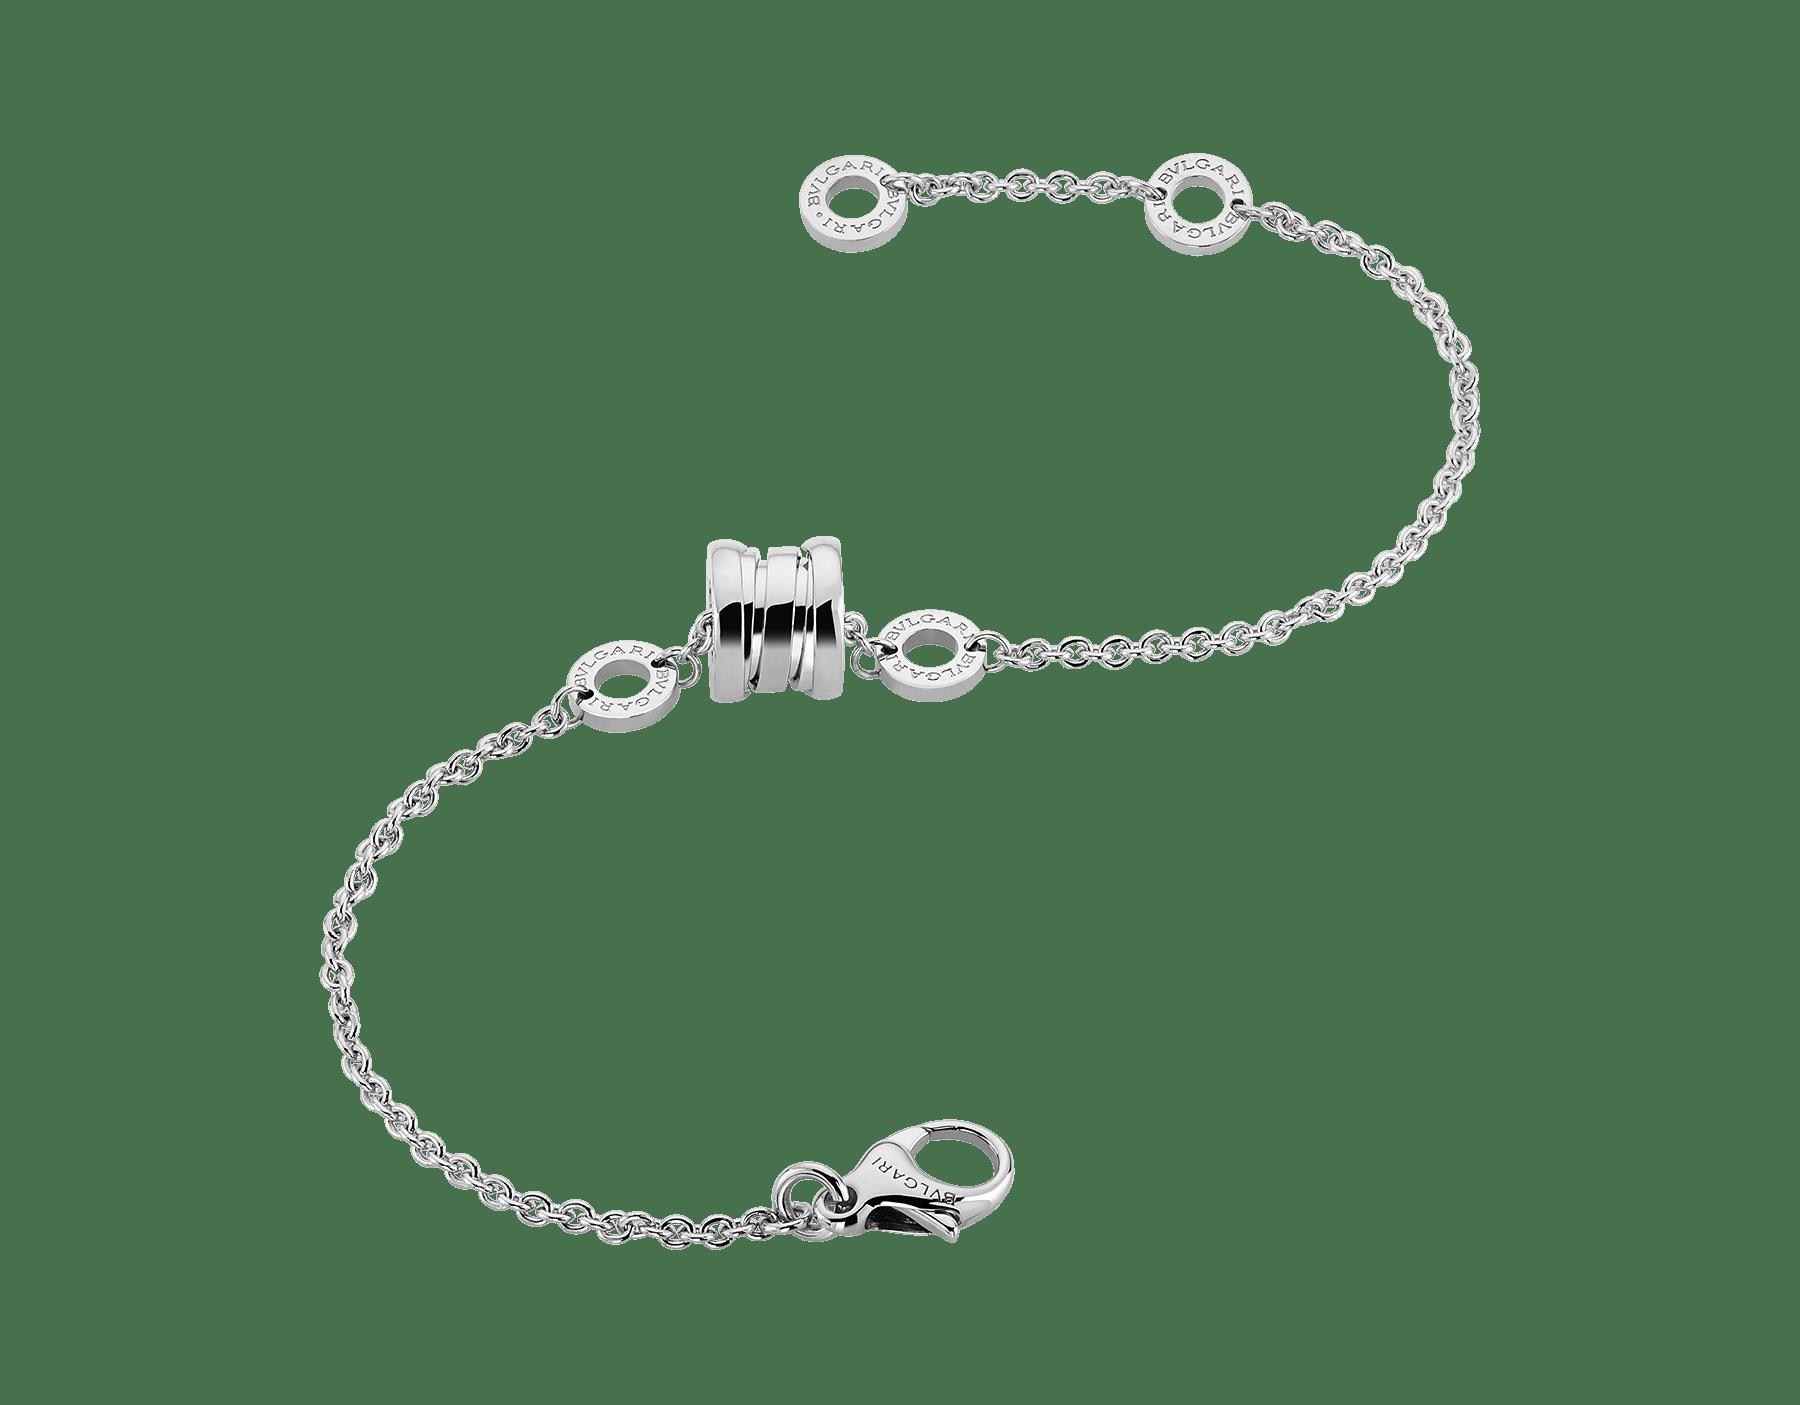 Pulsera flexible B.zero1 en oro blanco de 18 qt. BR853720 image 2